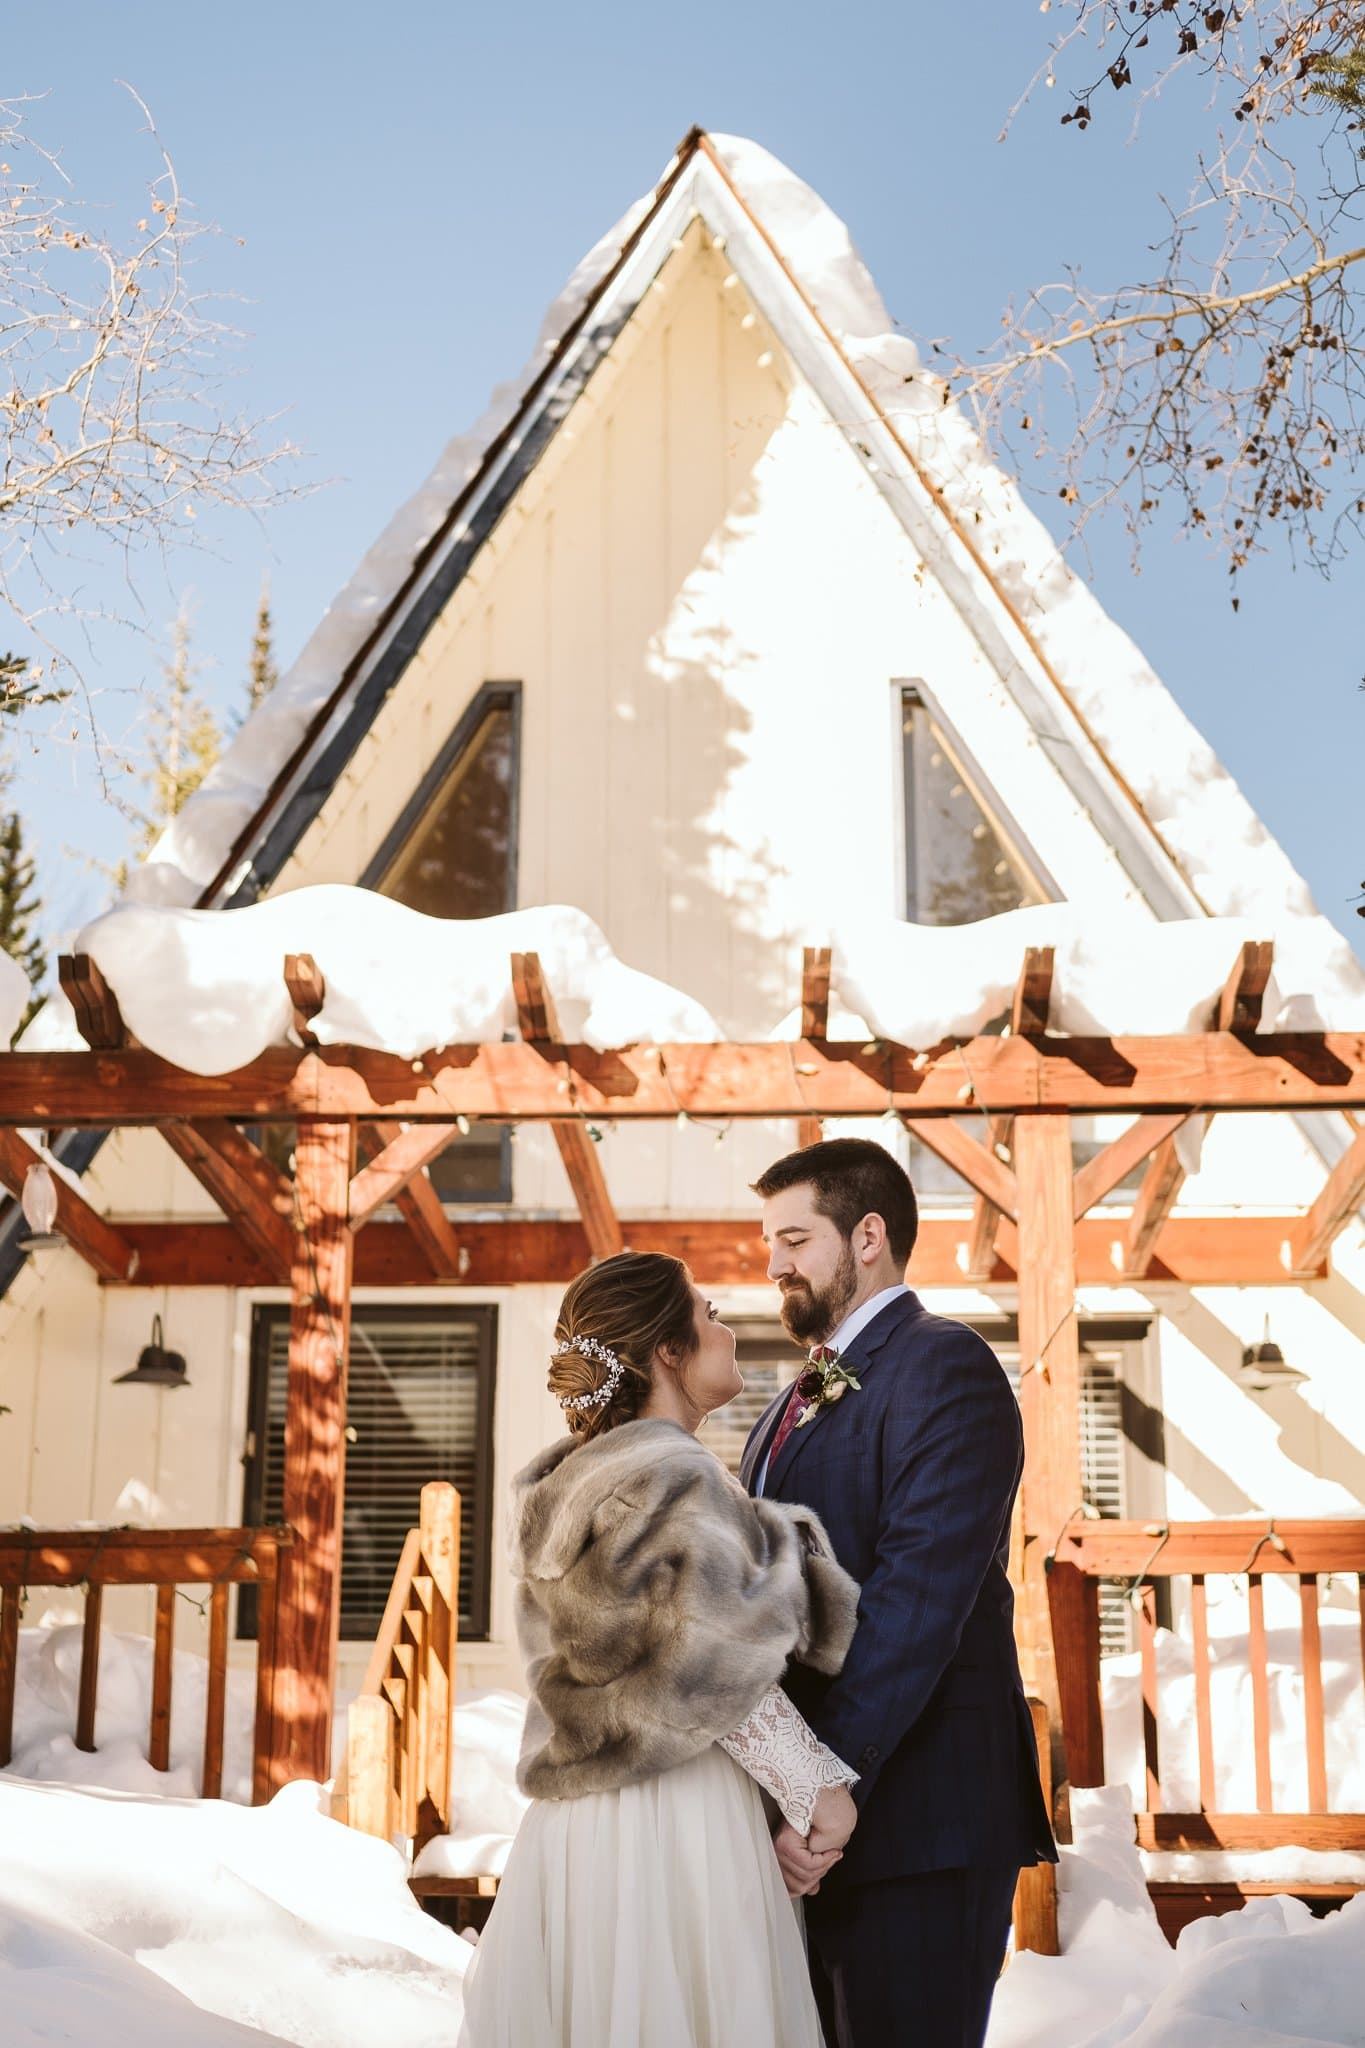 A-frame cabin winter elopement in Breckenridge, Colorado.